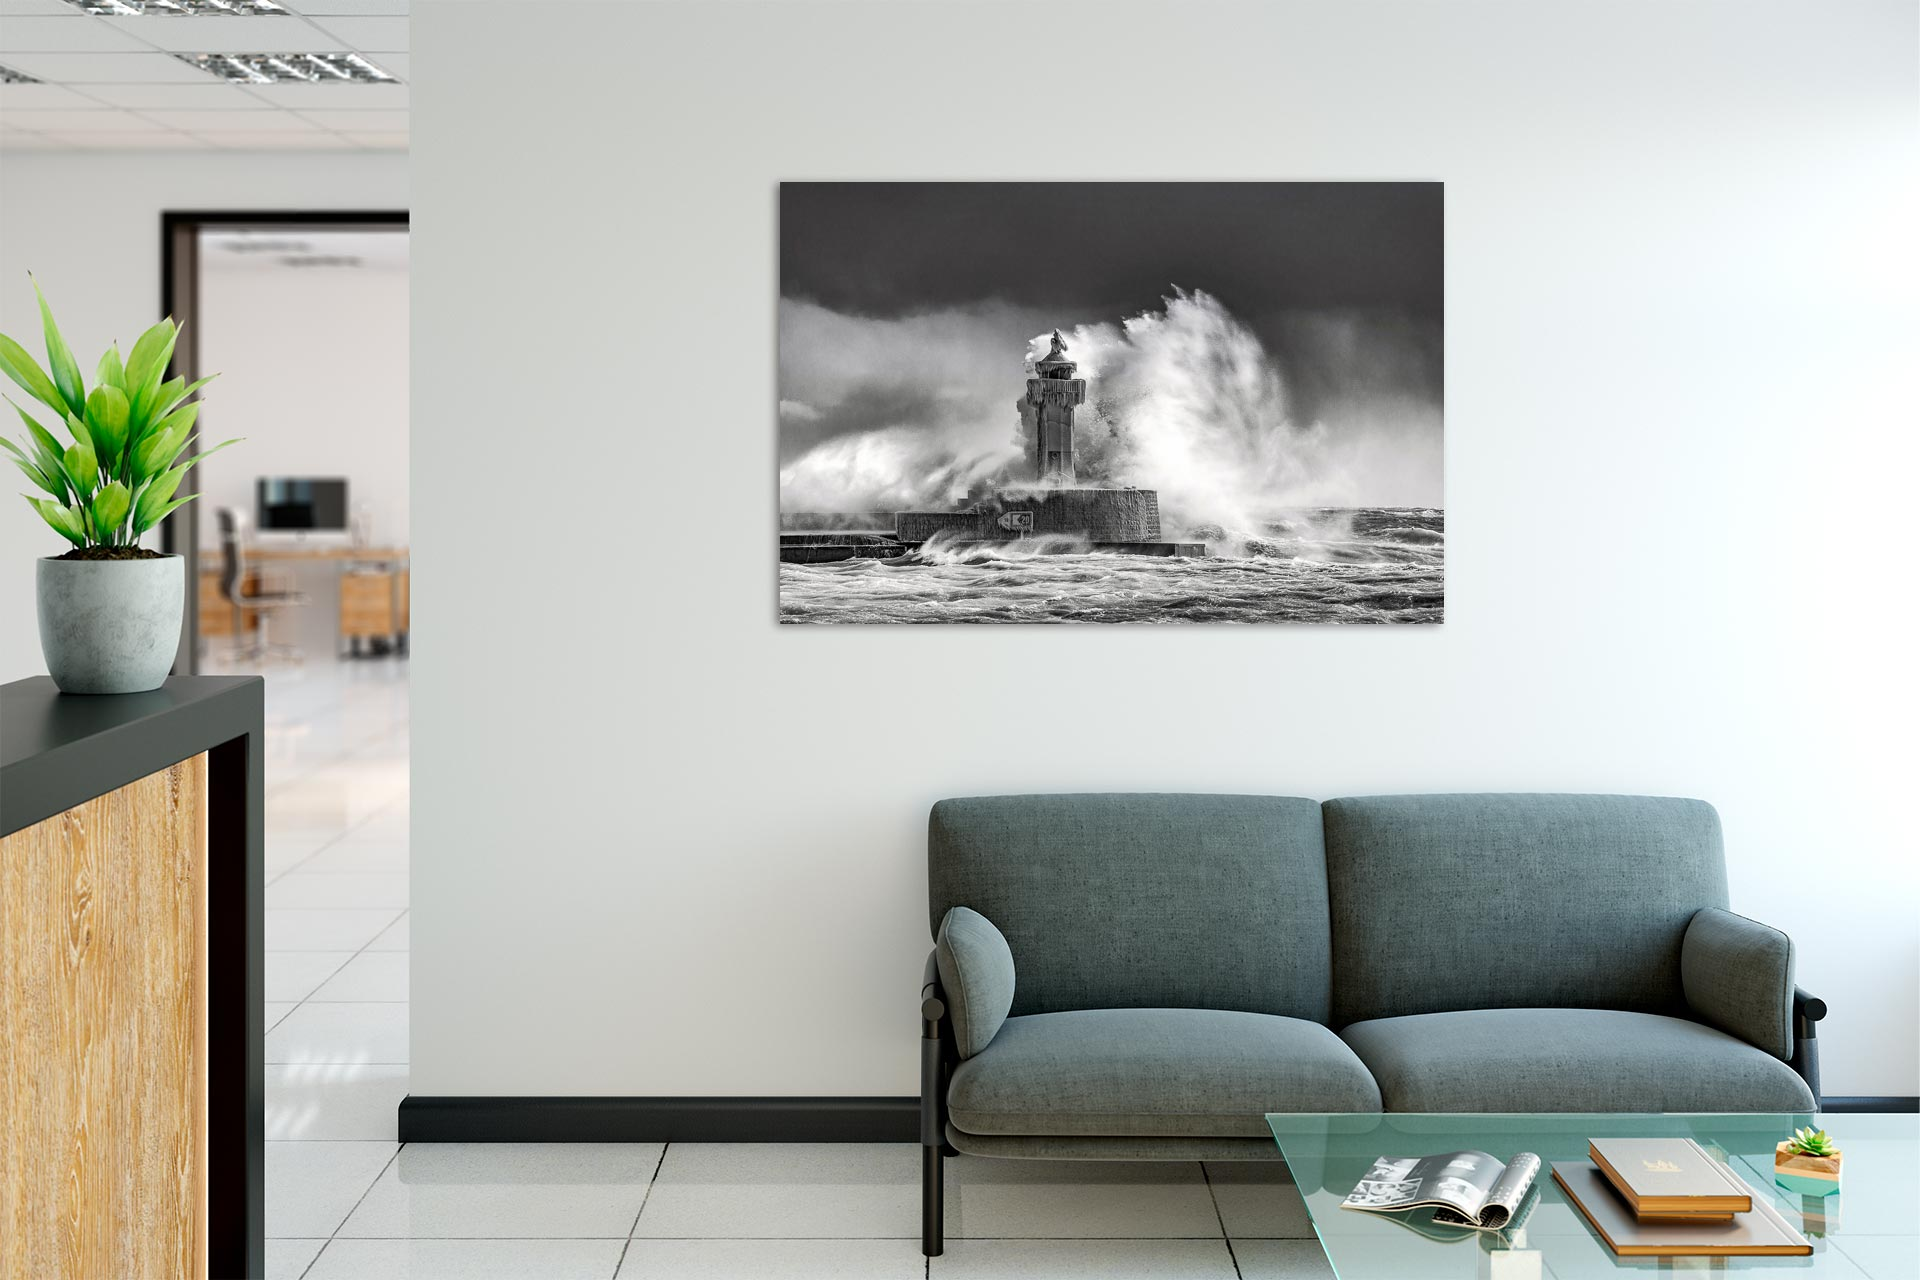 LSW300-leuchtfeuer-wandbild-auf-leinwand-acrylglas-aludibond-empfang